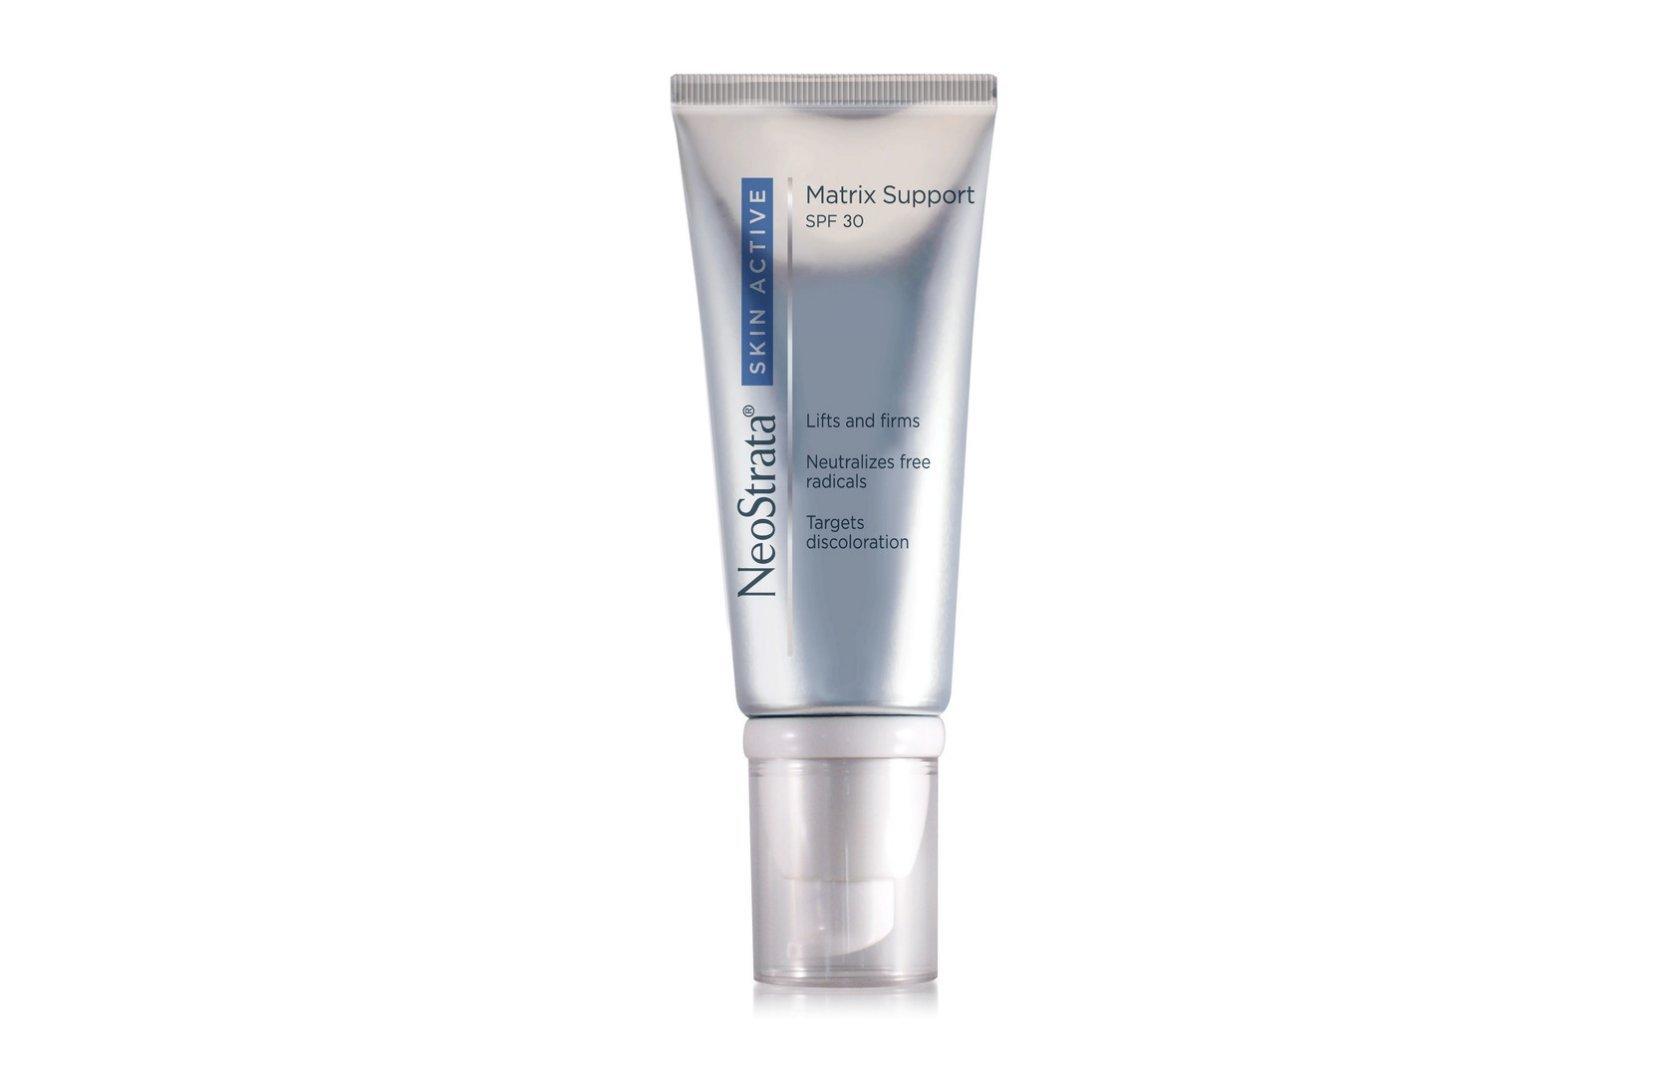 NeoStrata Skin Active Matrix Support SPF 30, 1.75 Ounce